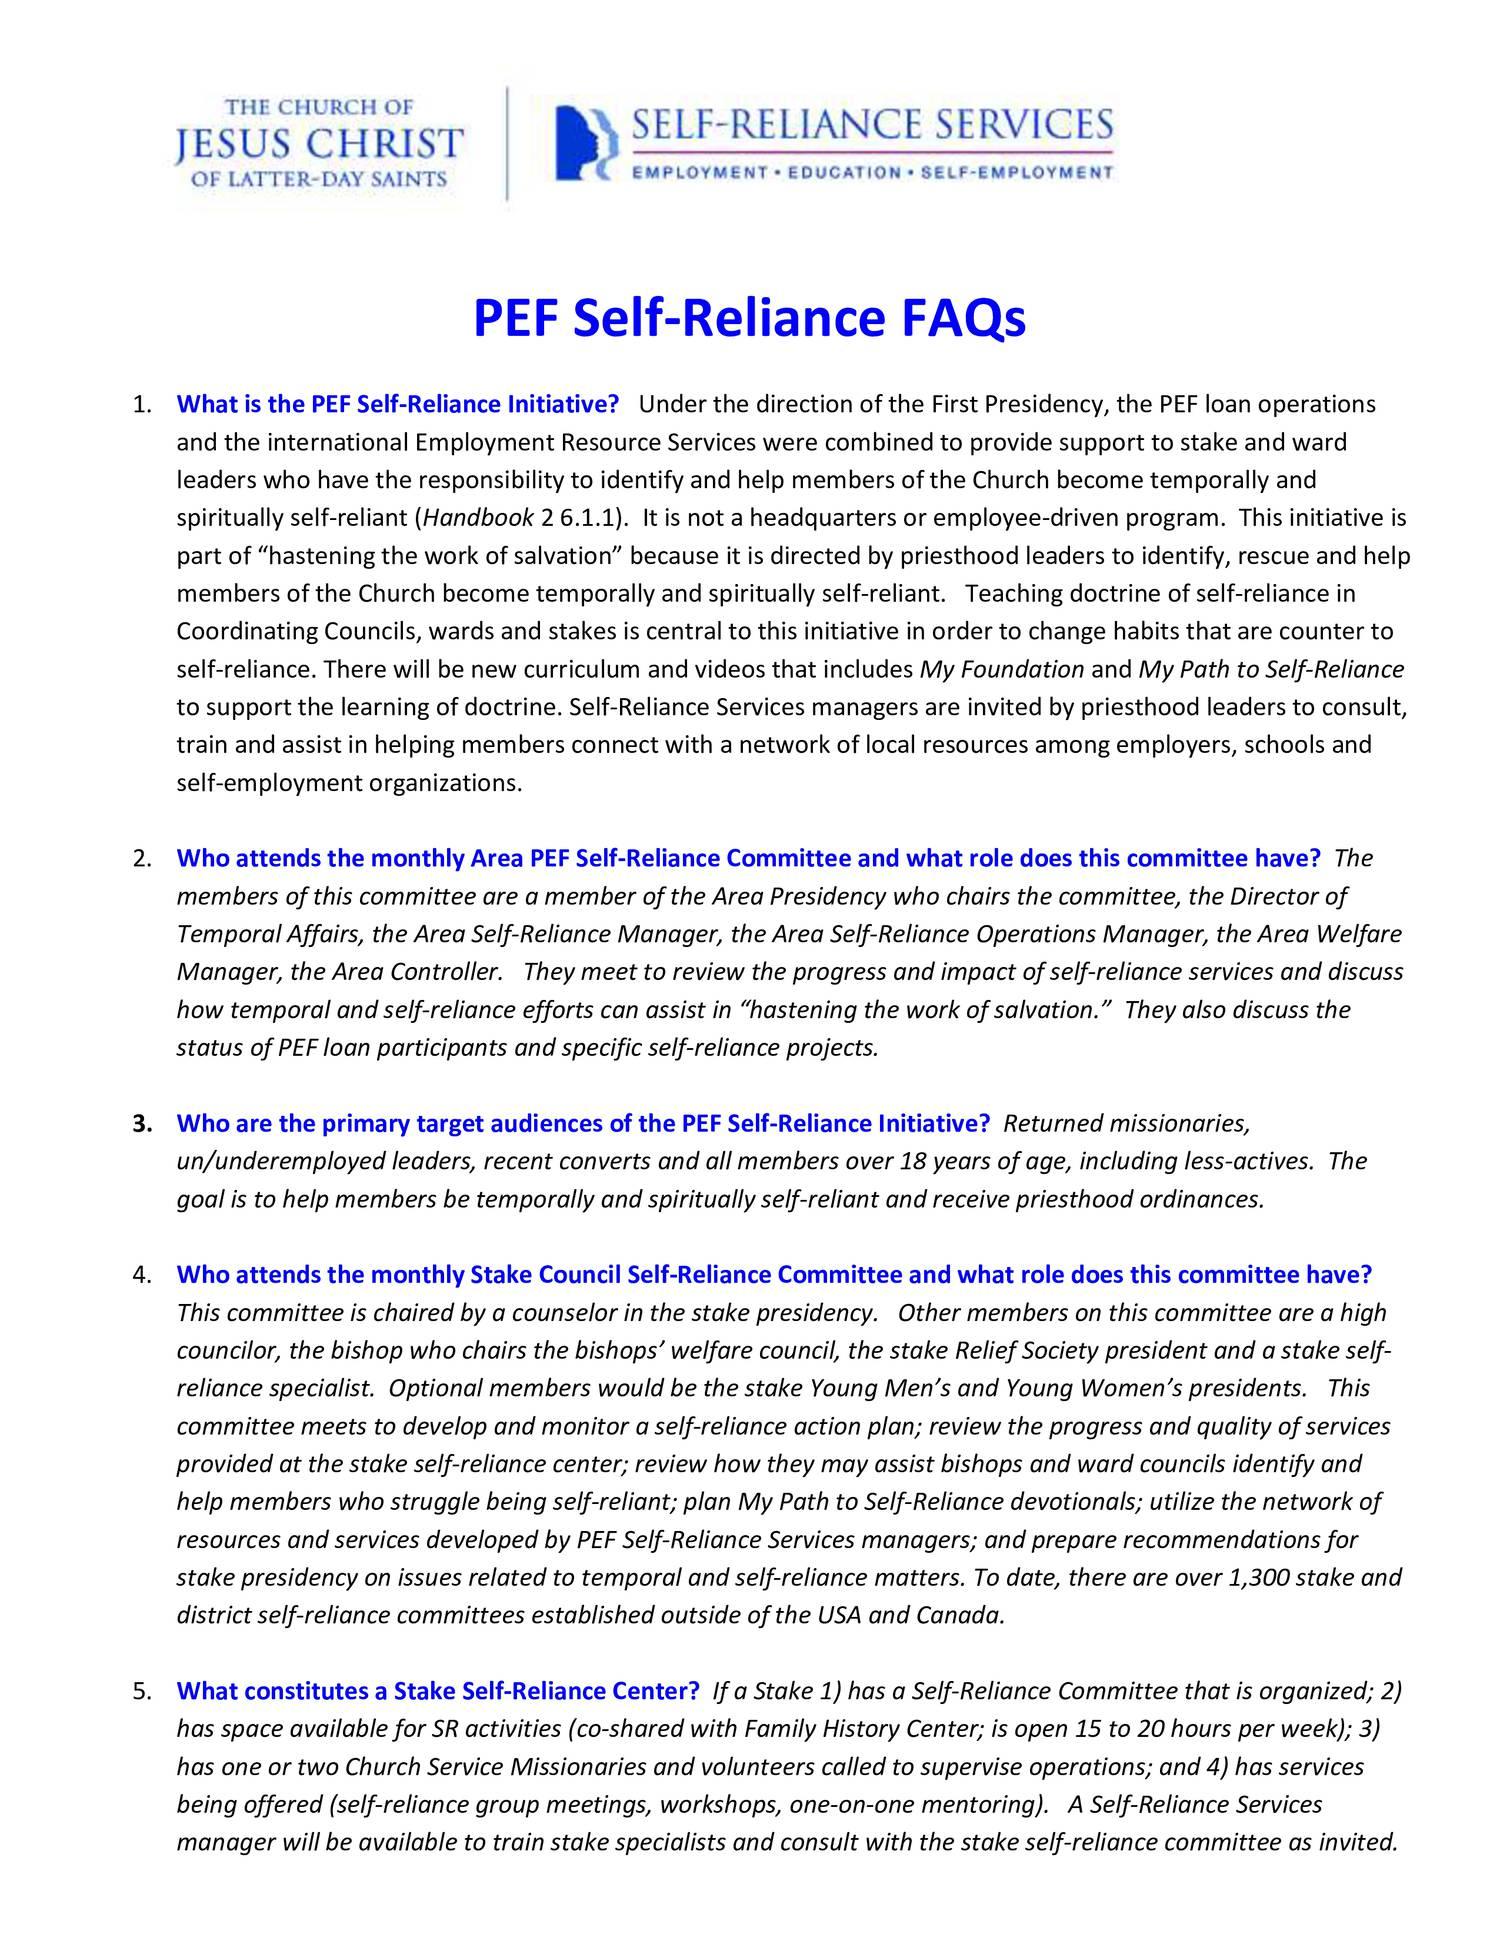 pef self reliance faqs pdf docdroid